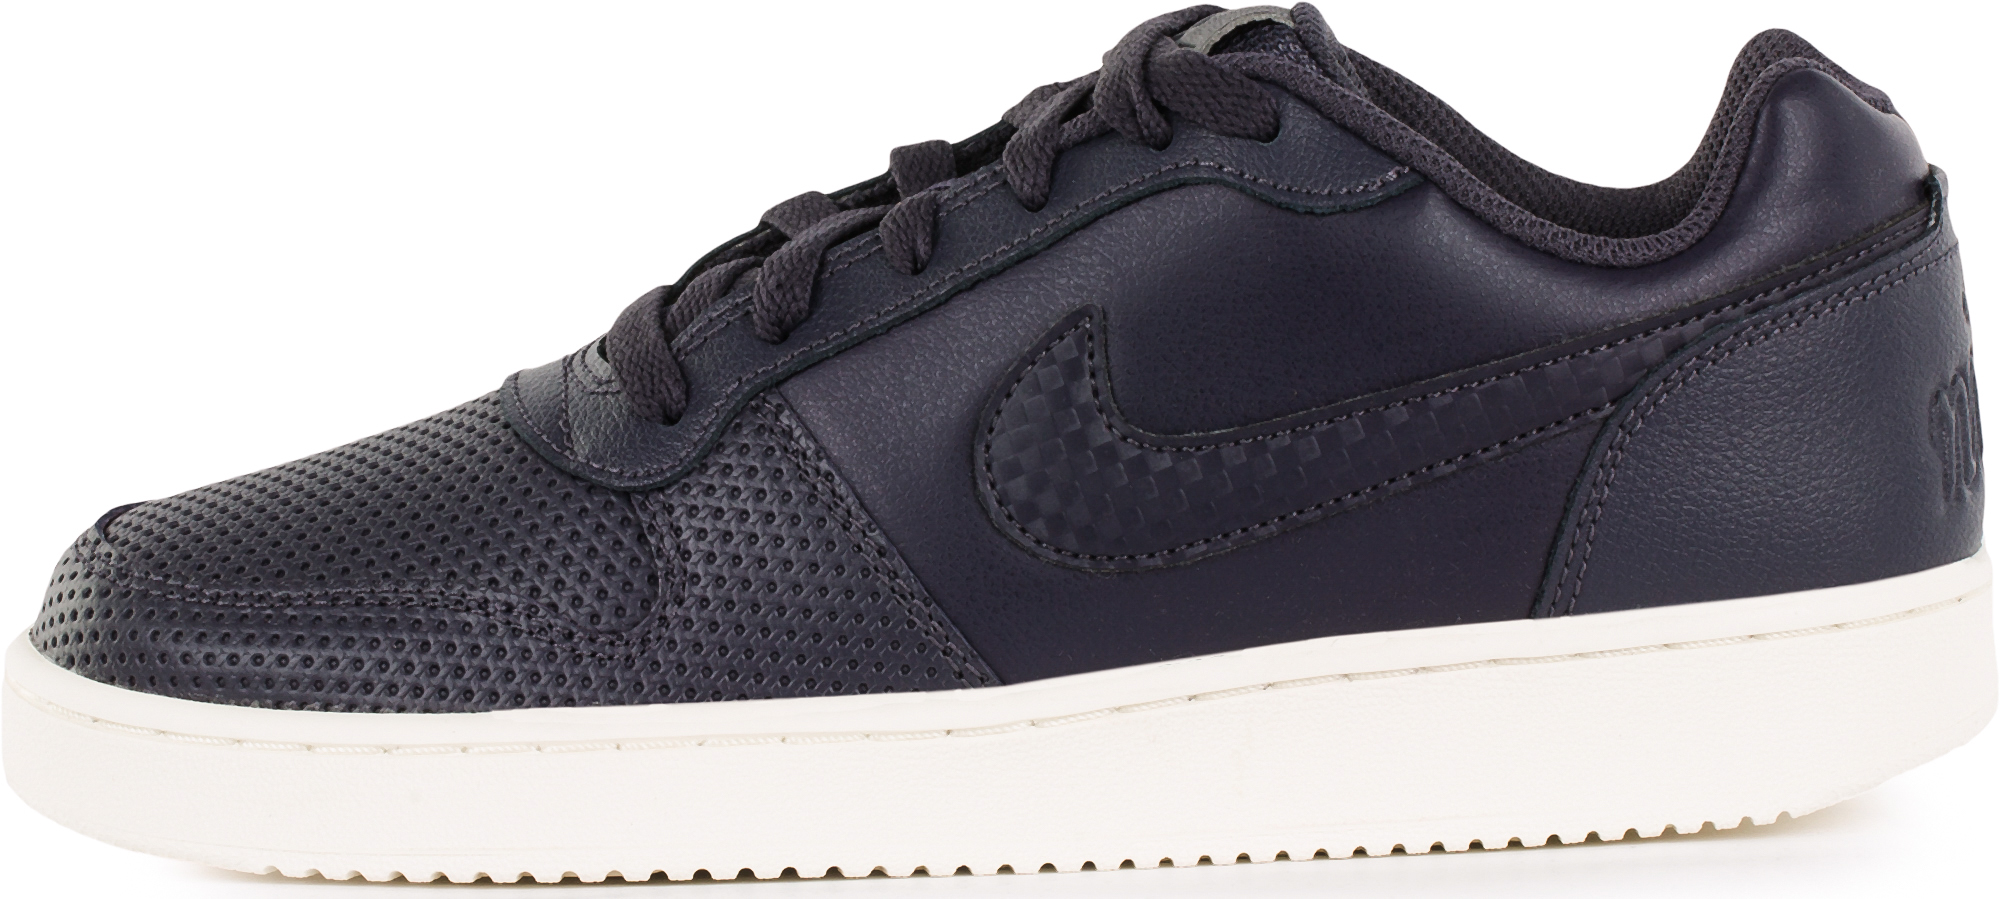 Nike Кеды женские Nike Ebernon Low Premium, размер 41 женские кеды ulzzang